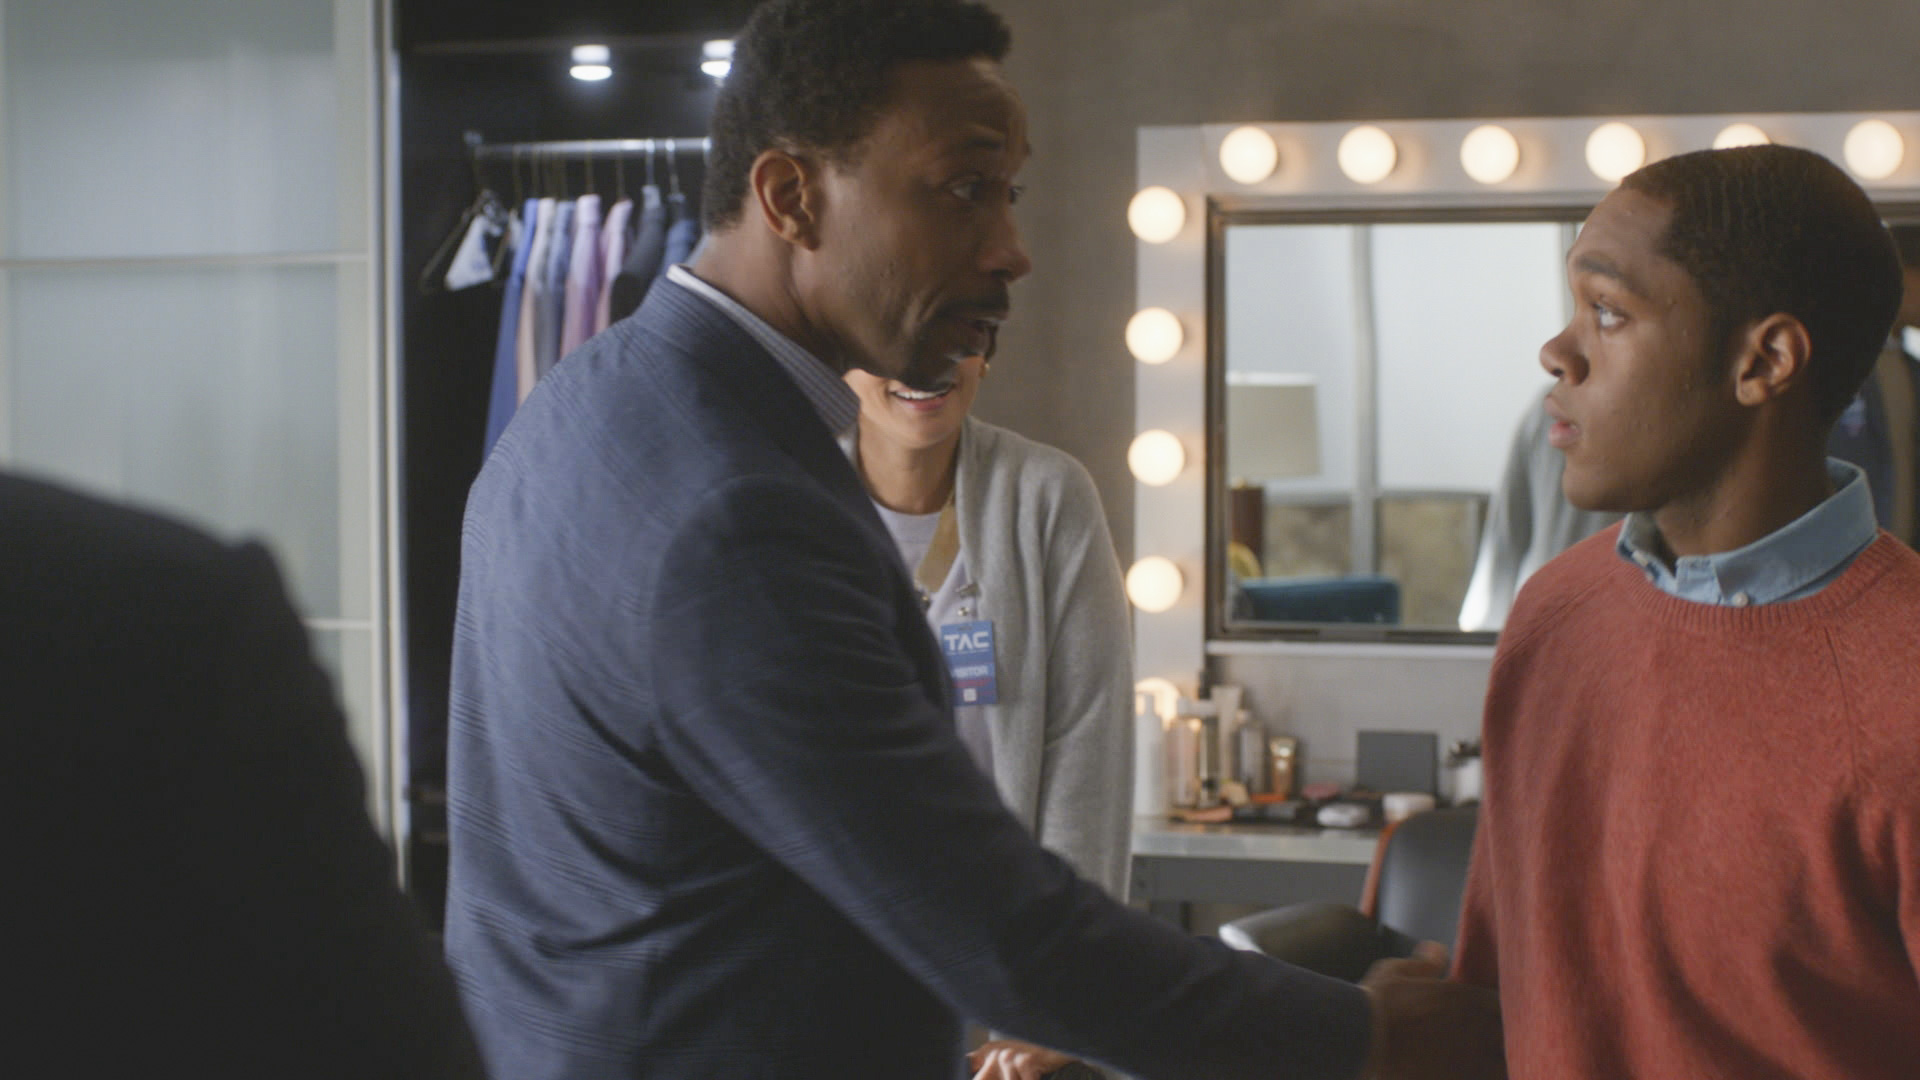 William Henderson confronts his son.